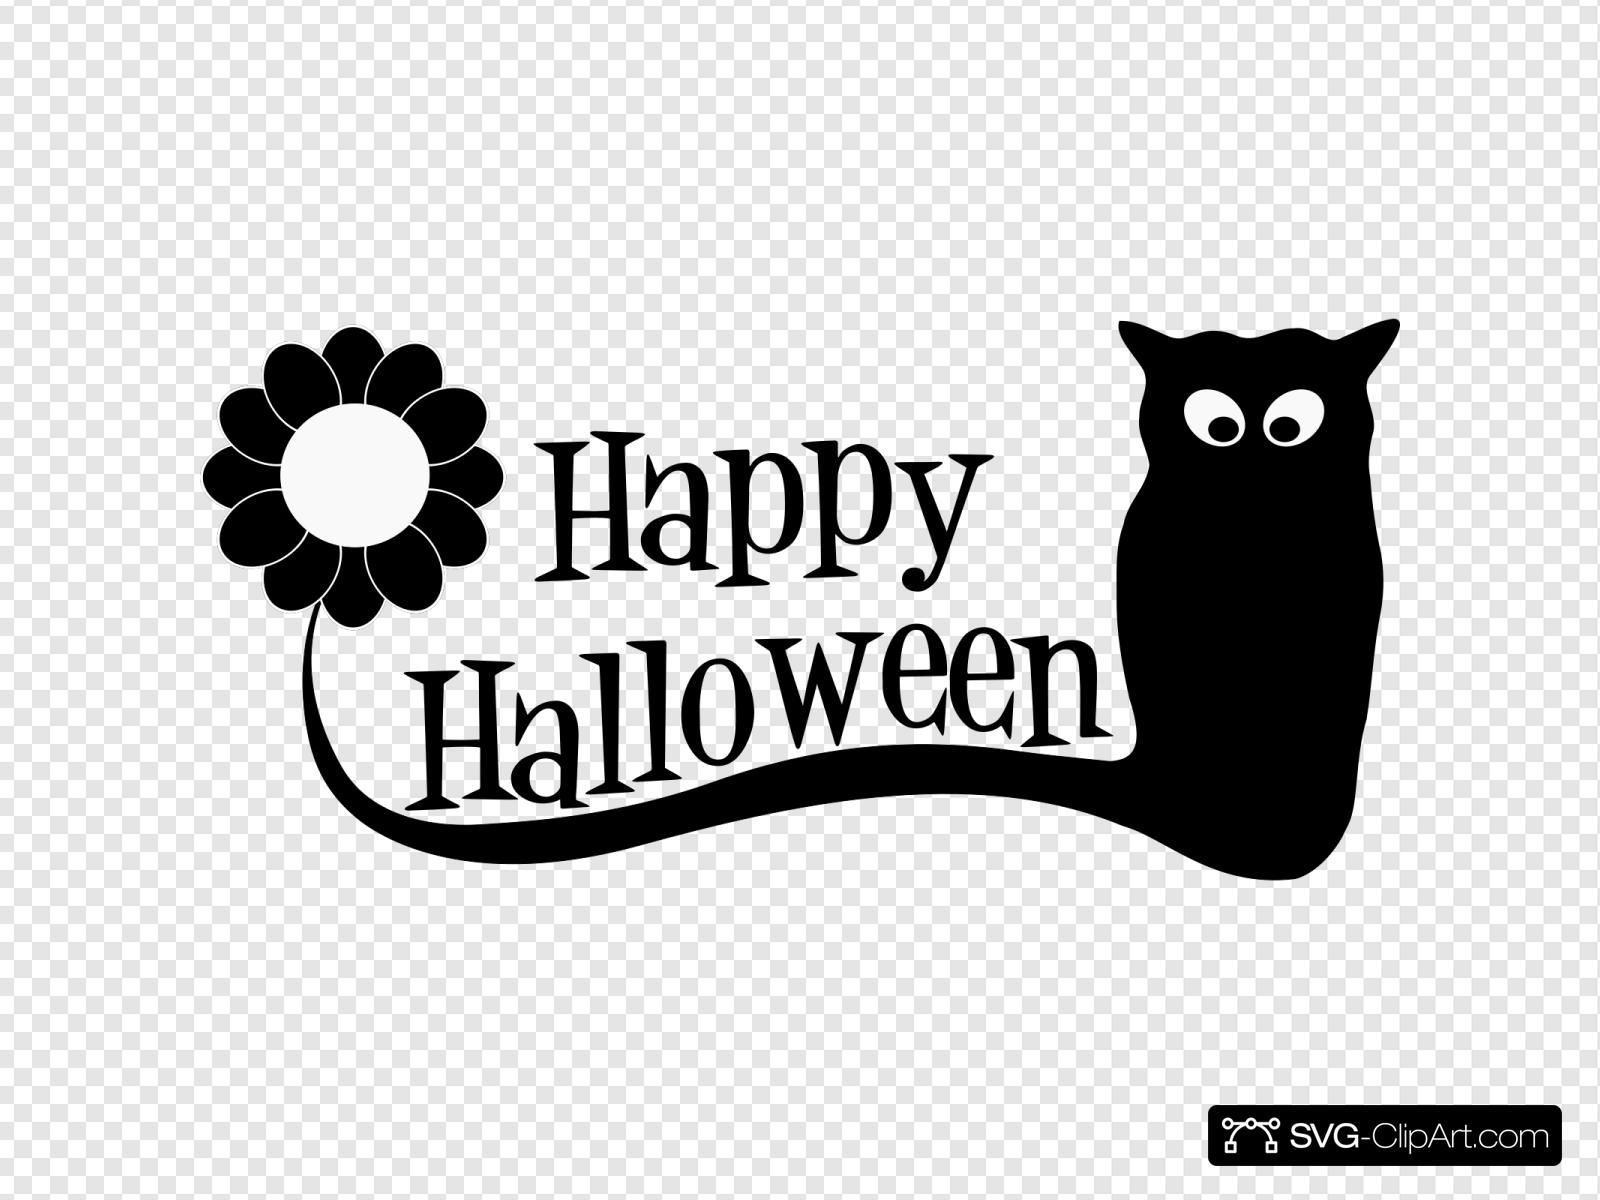 Halloween owl clipart. Free download transparent .PNG | Creazilla